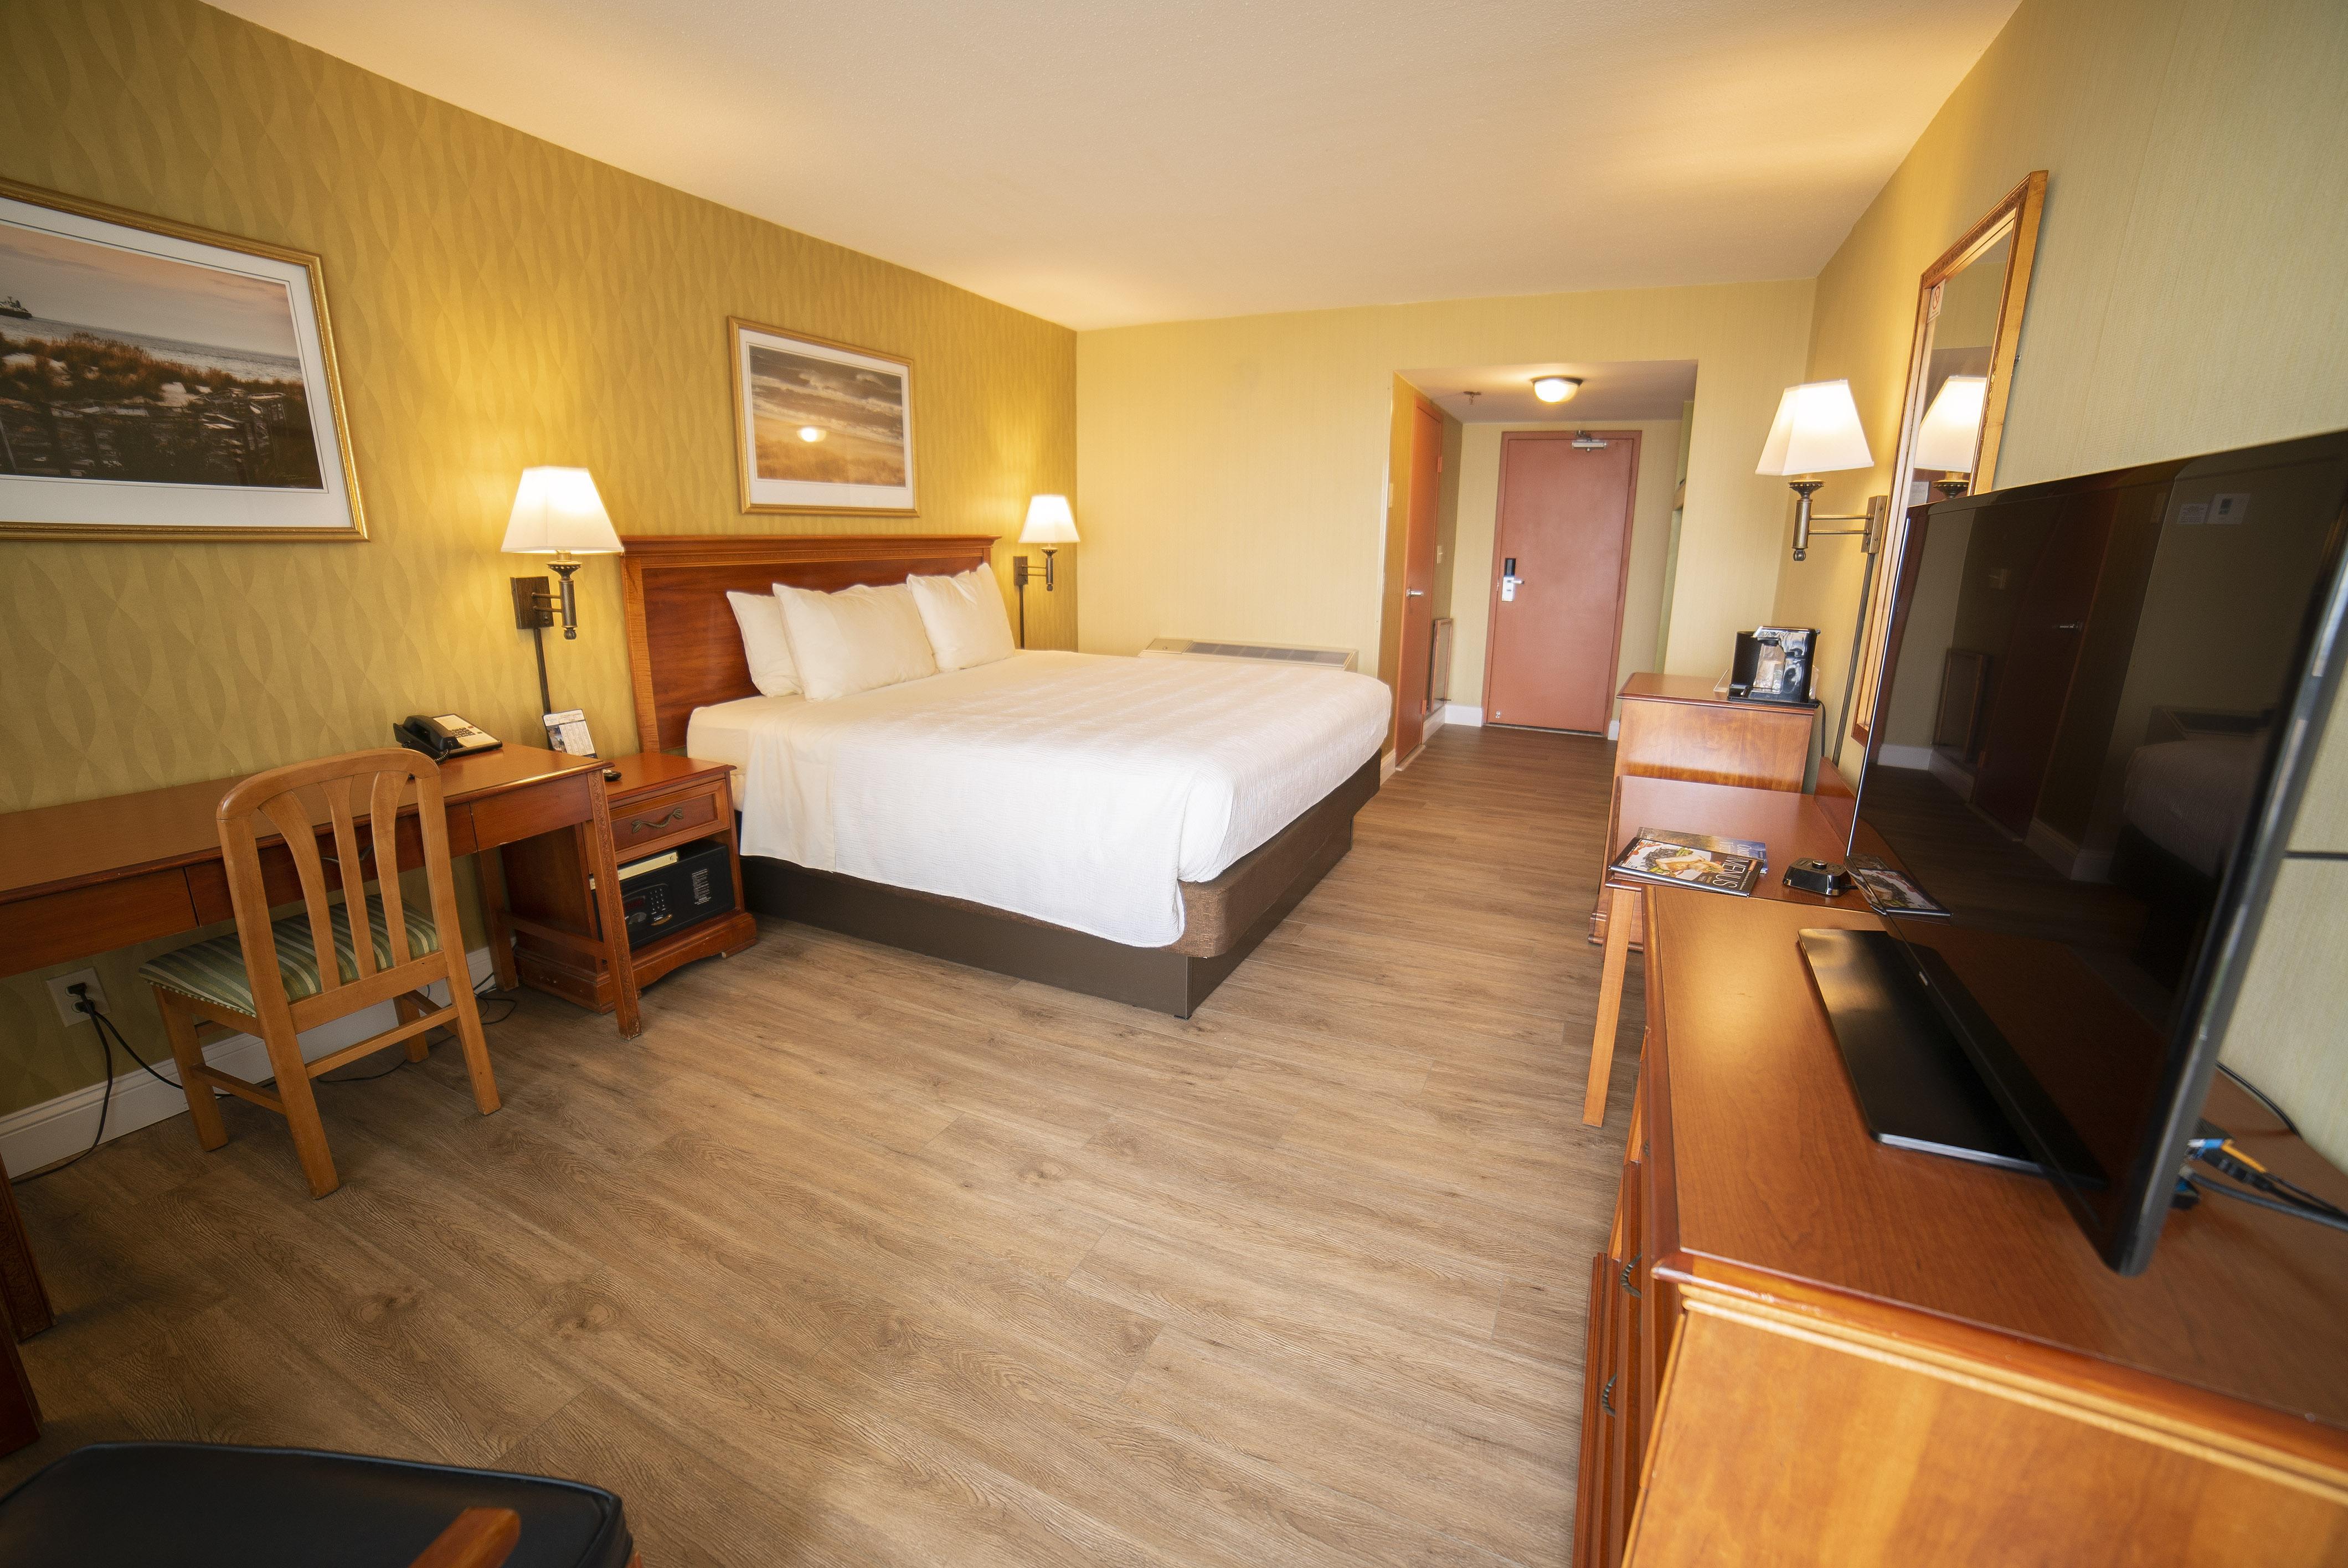 King Room Rearview 2020